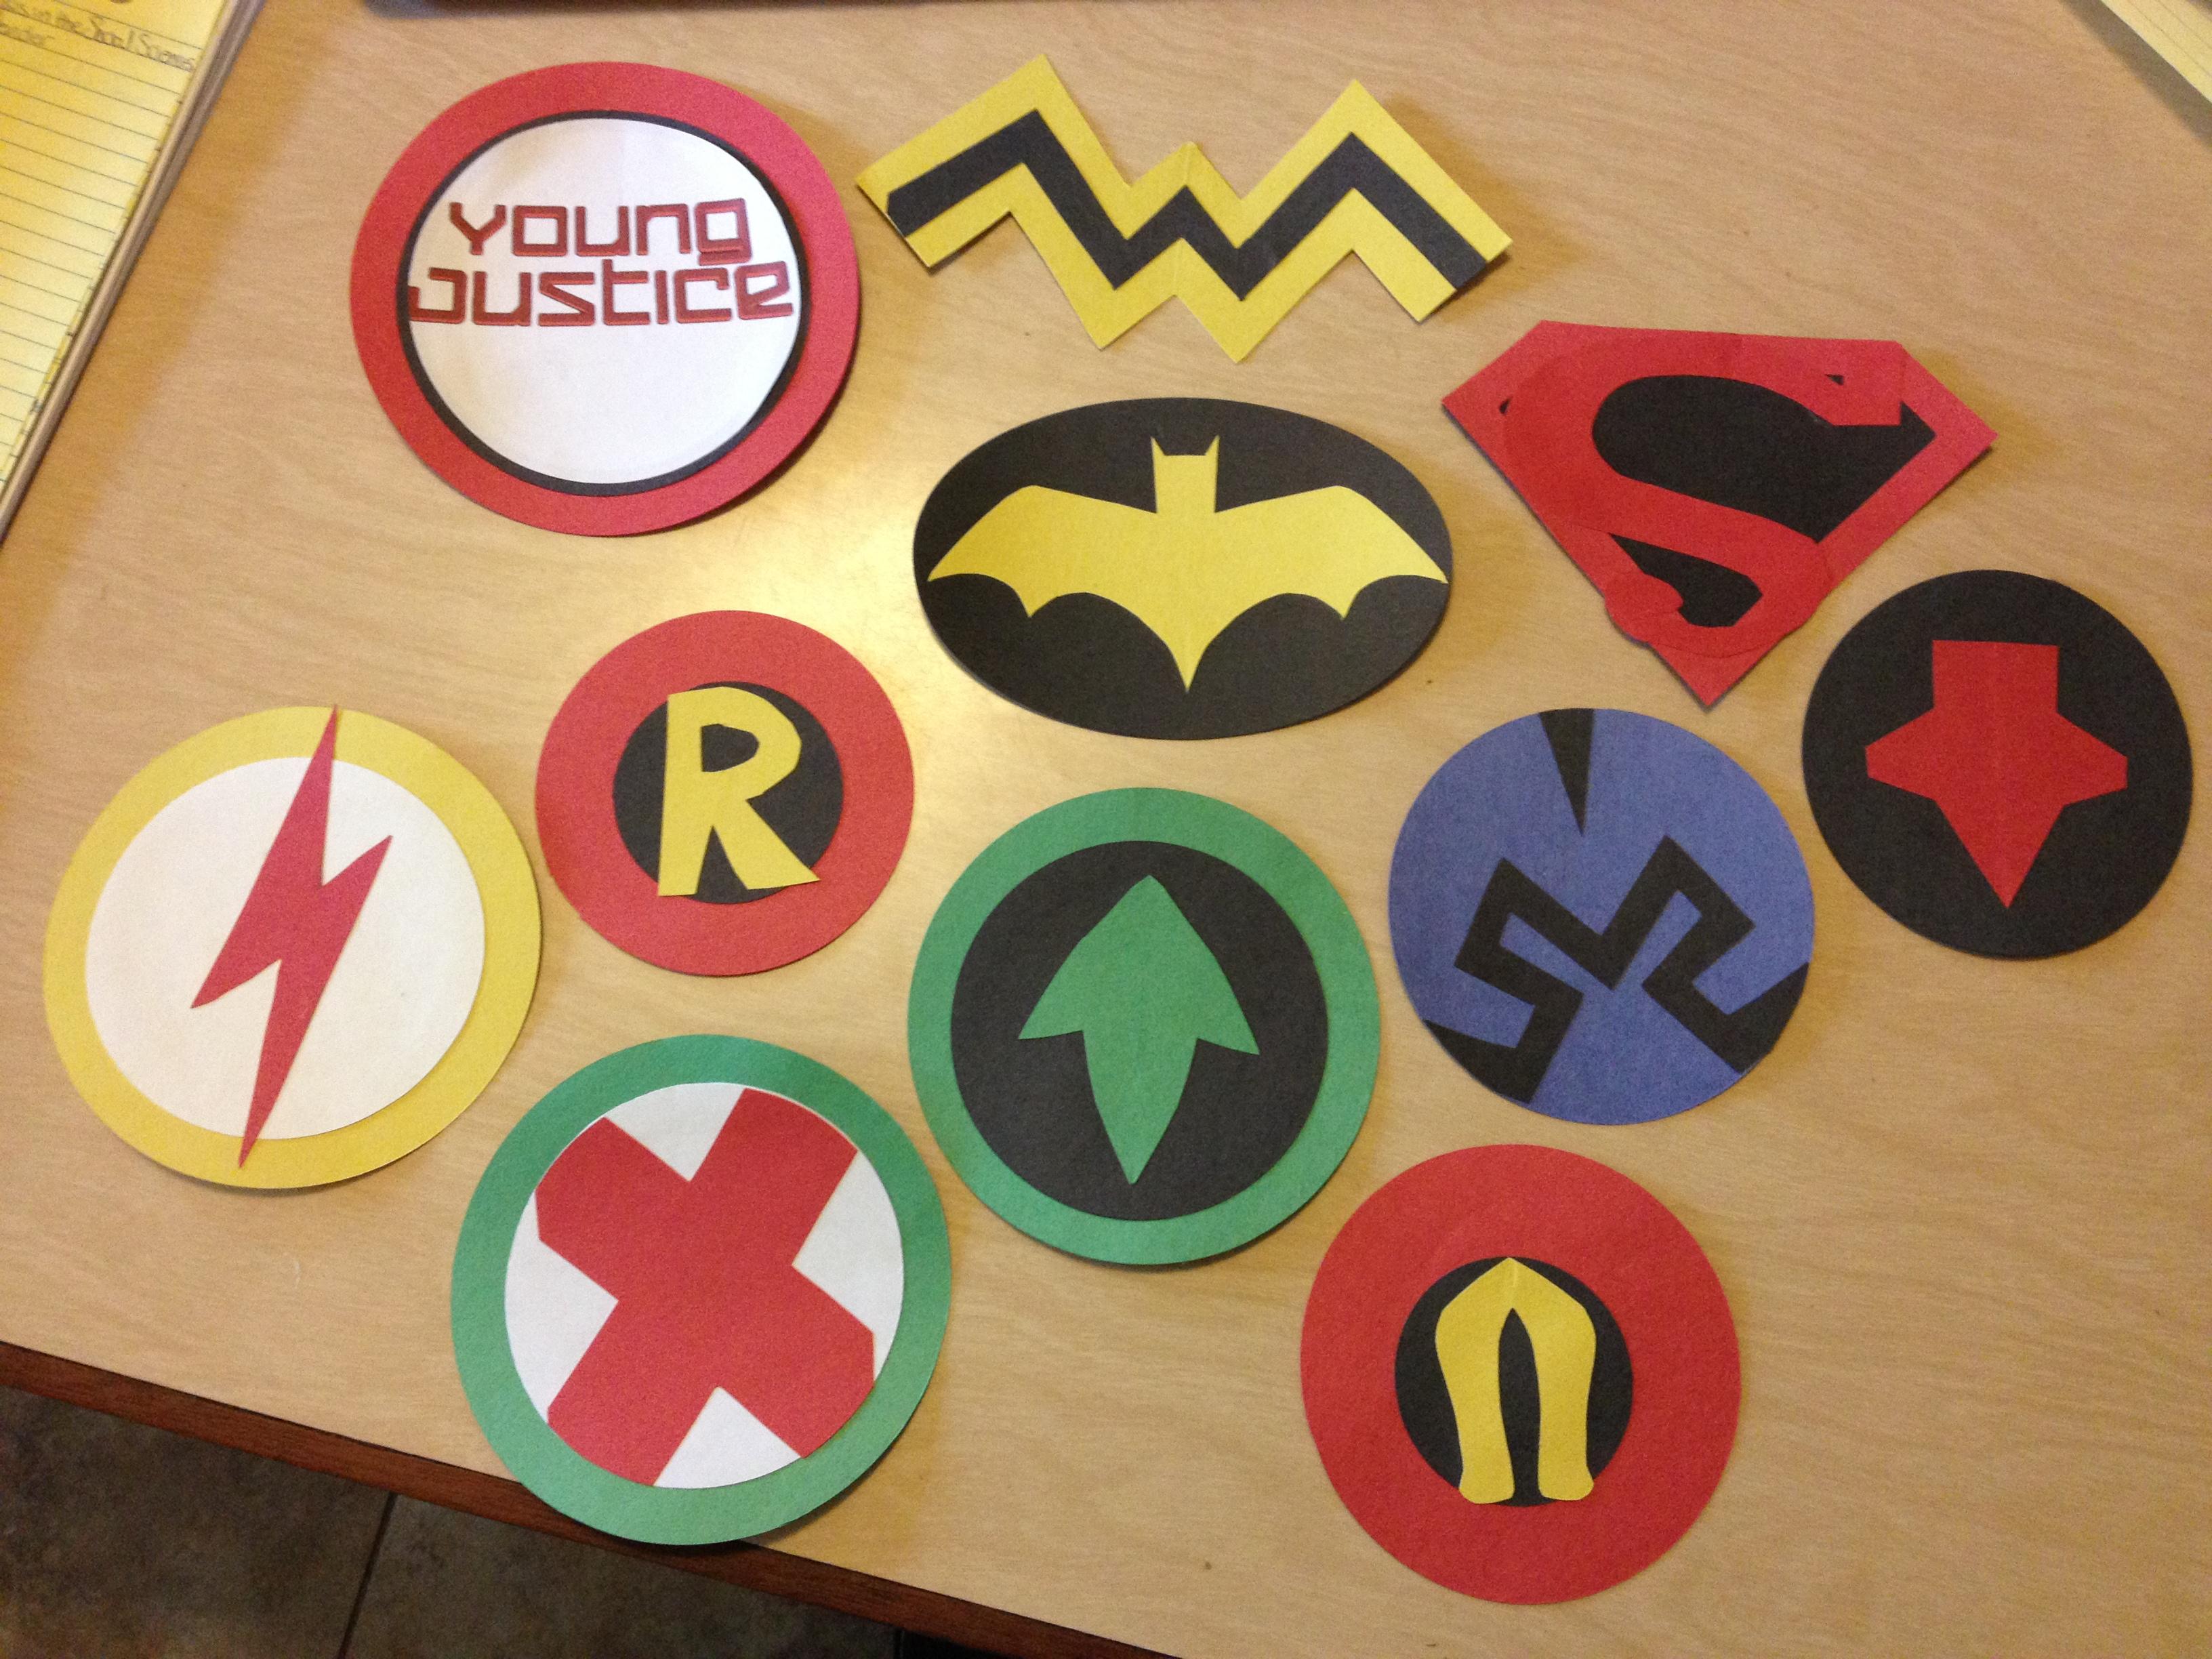 Young justice robin Logos.